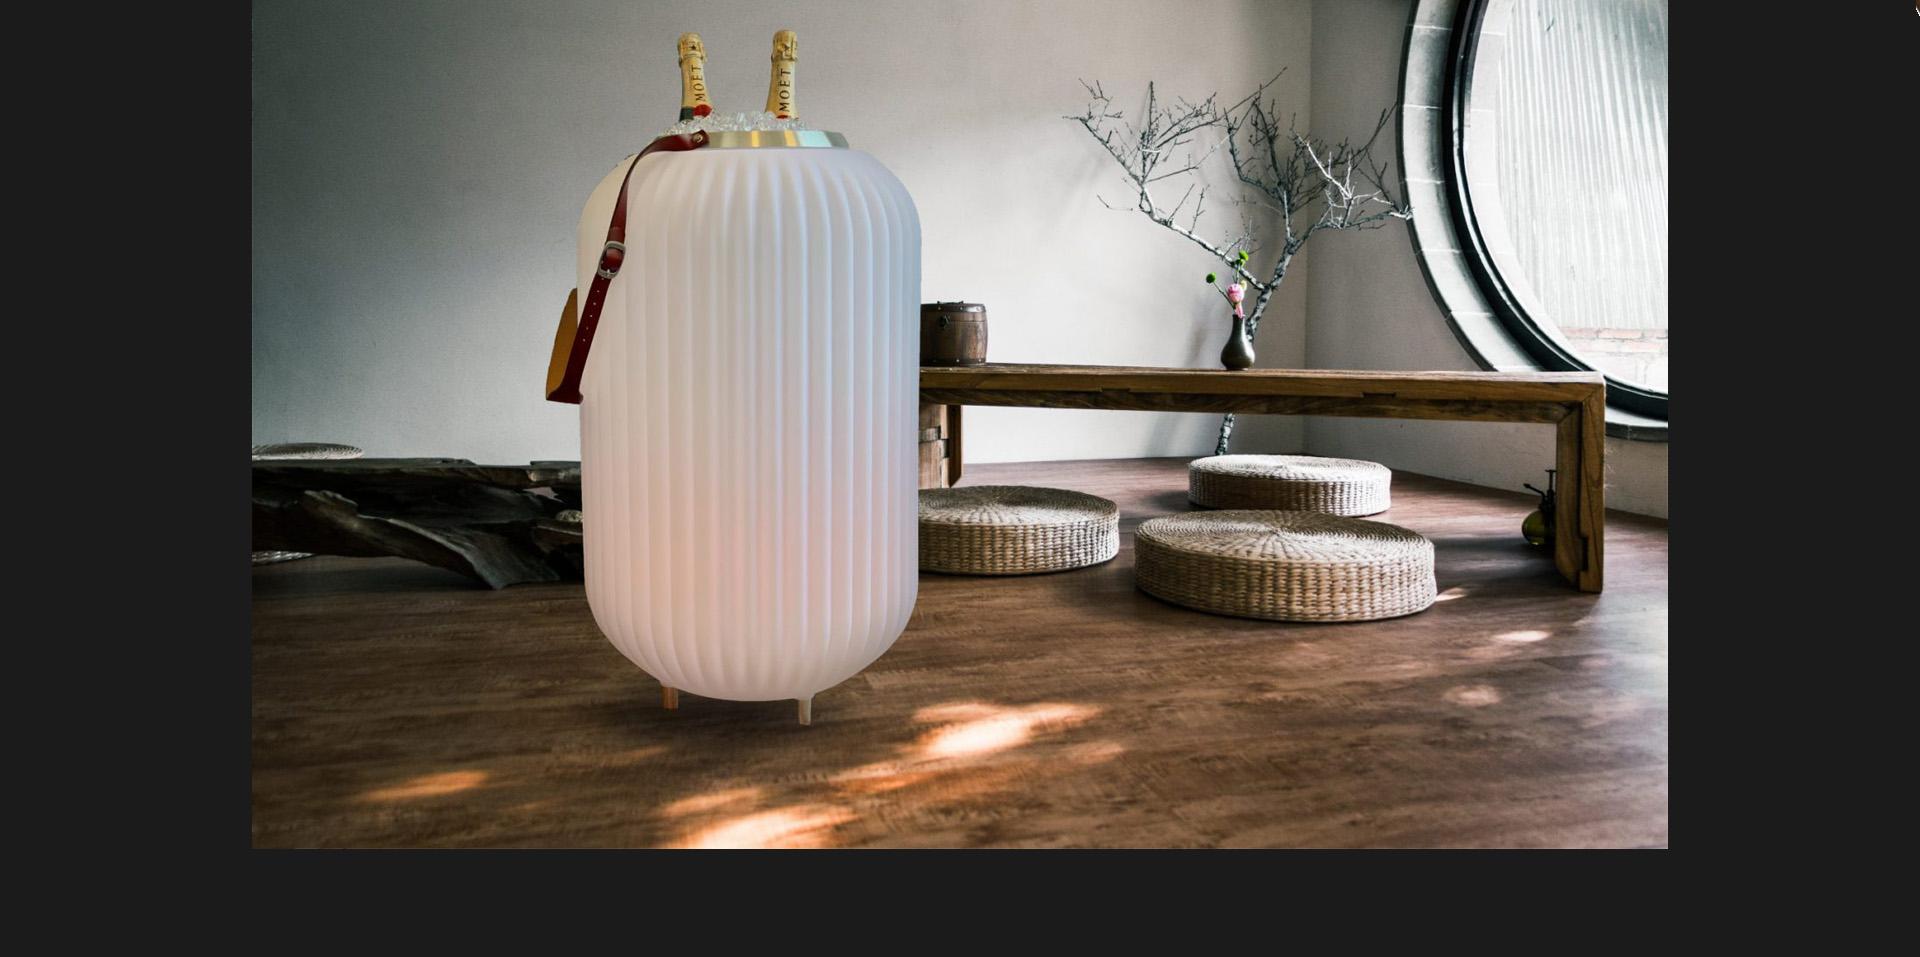 nikki-amsterdam-banner-lampion-l-bluetooth-speaker-wine-cooler-led-lighting